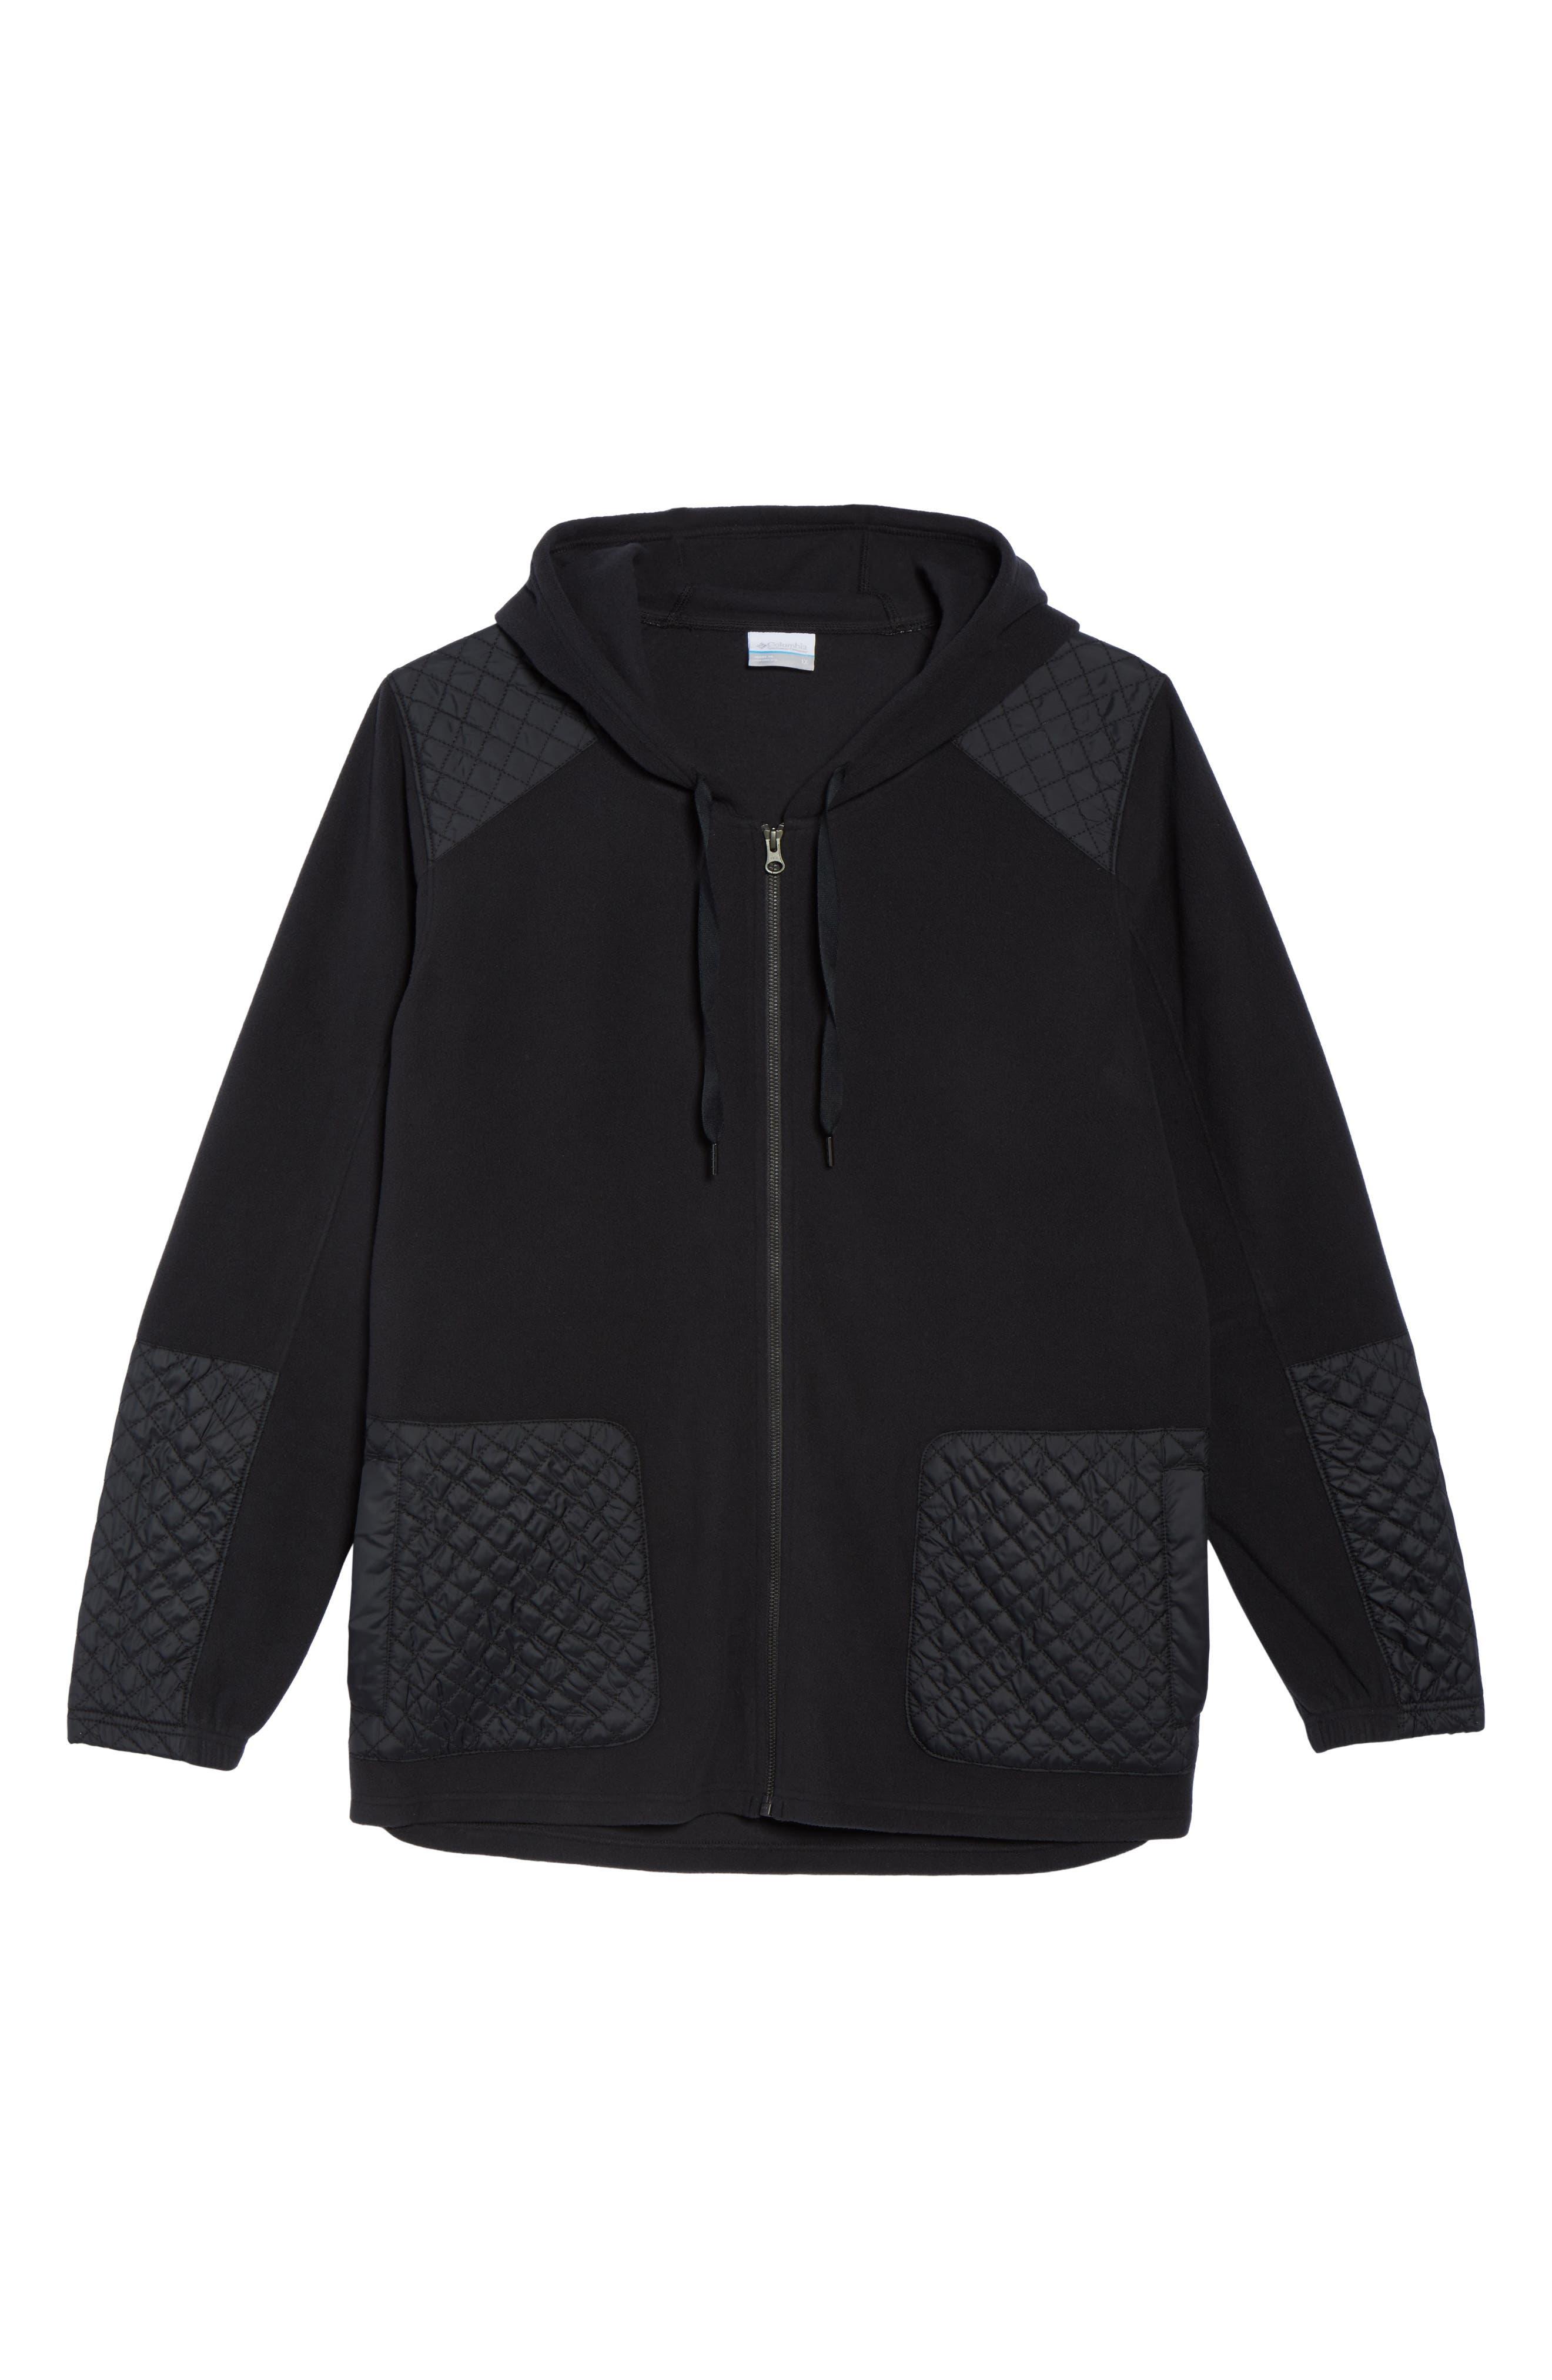 Warm Up Hooded Fleece Jacket,                             Alternate thumbnail 5, color,                             010